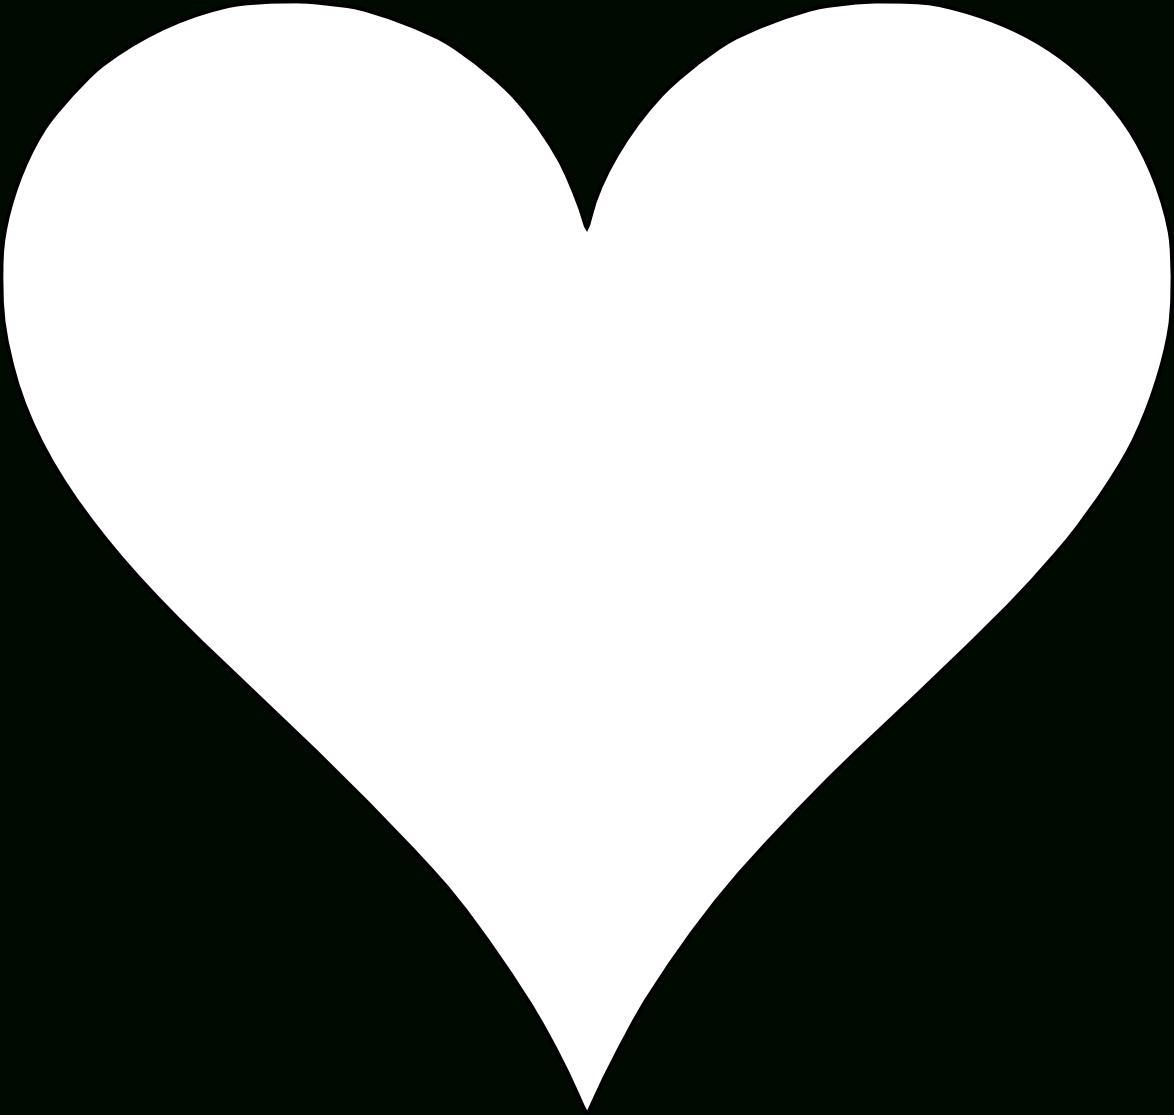 6 Free Printable Heart Templates   Heart Template, Printable Hearts - Free Printable Hearts